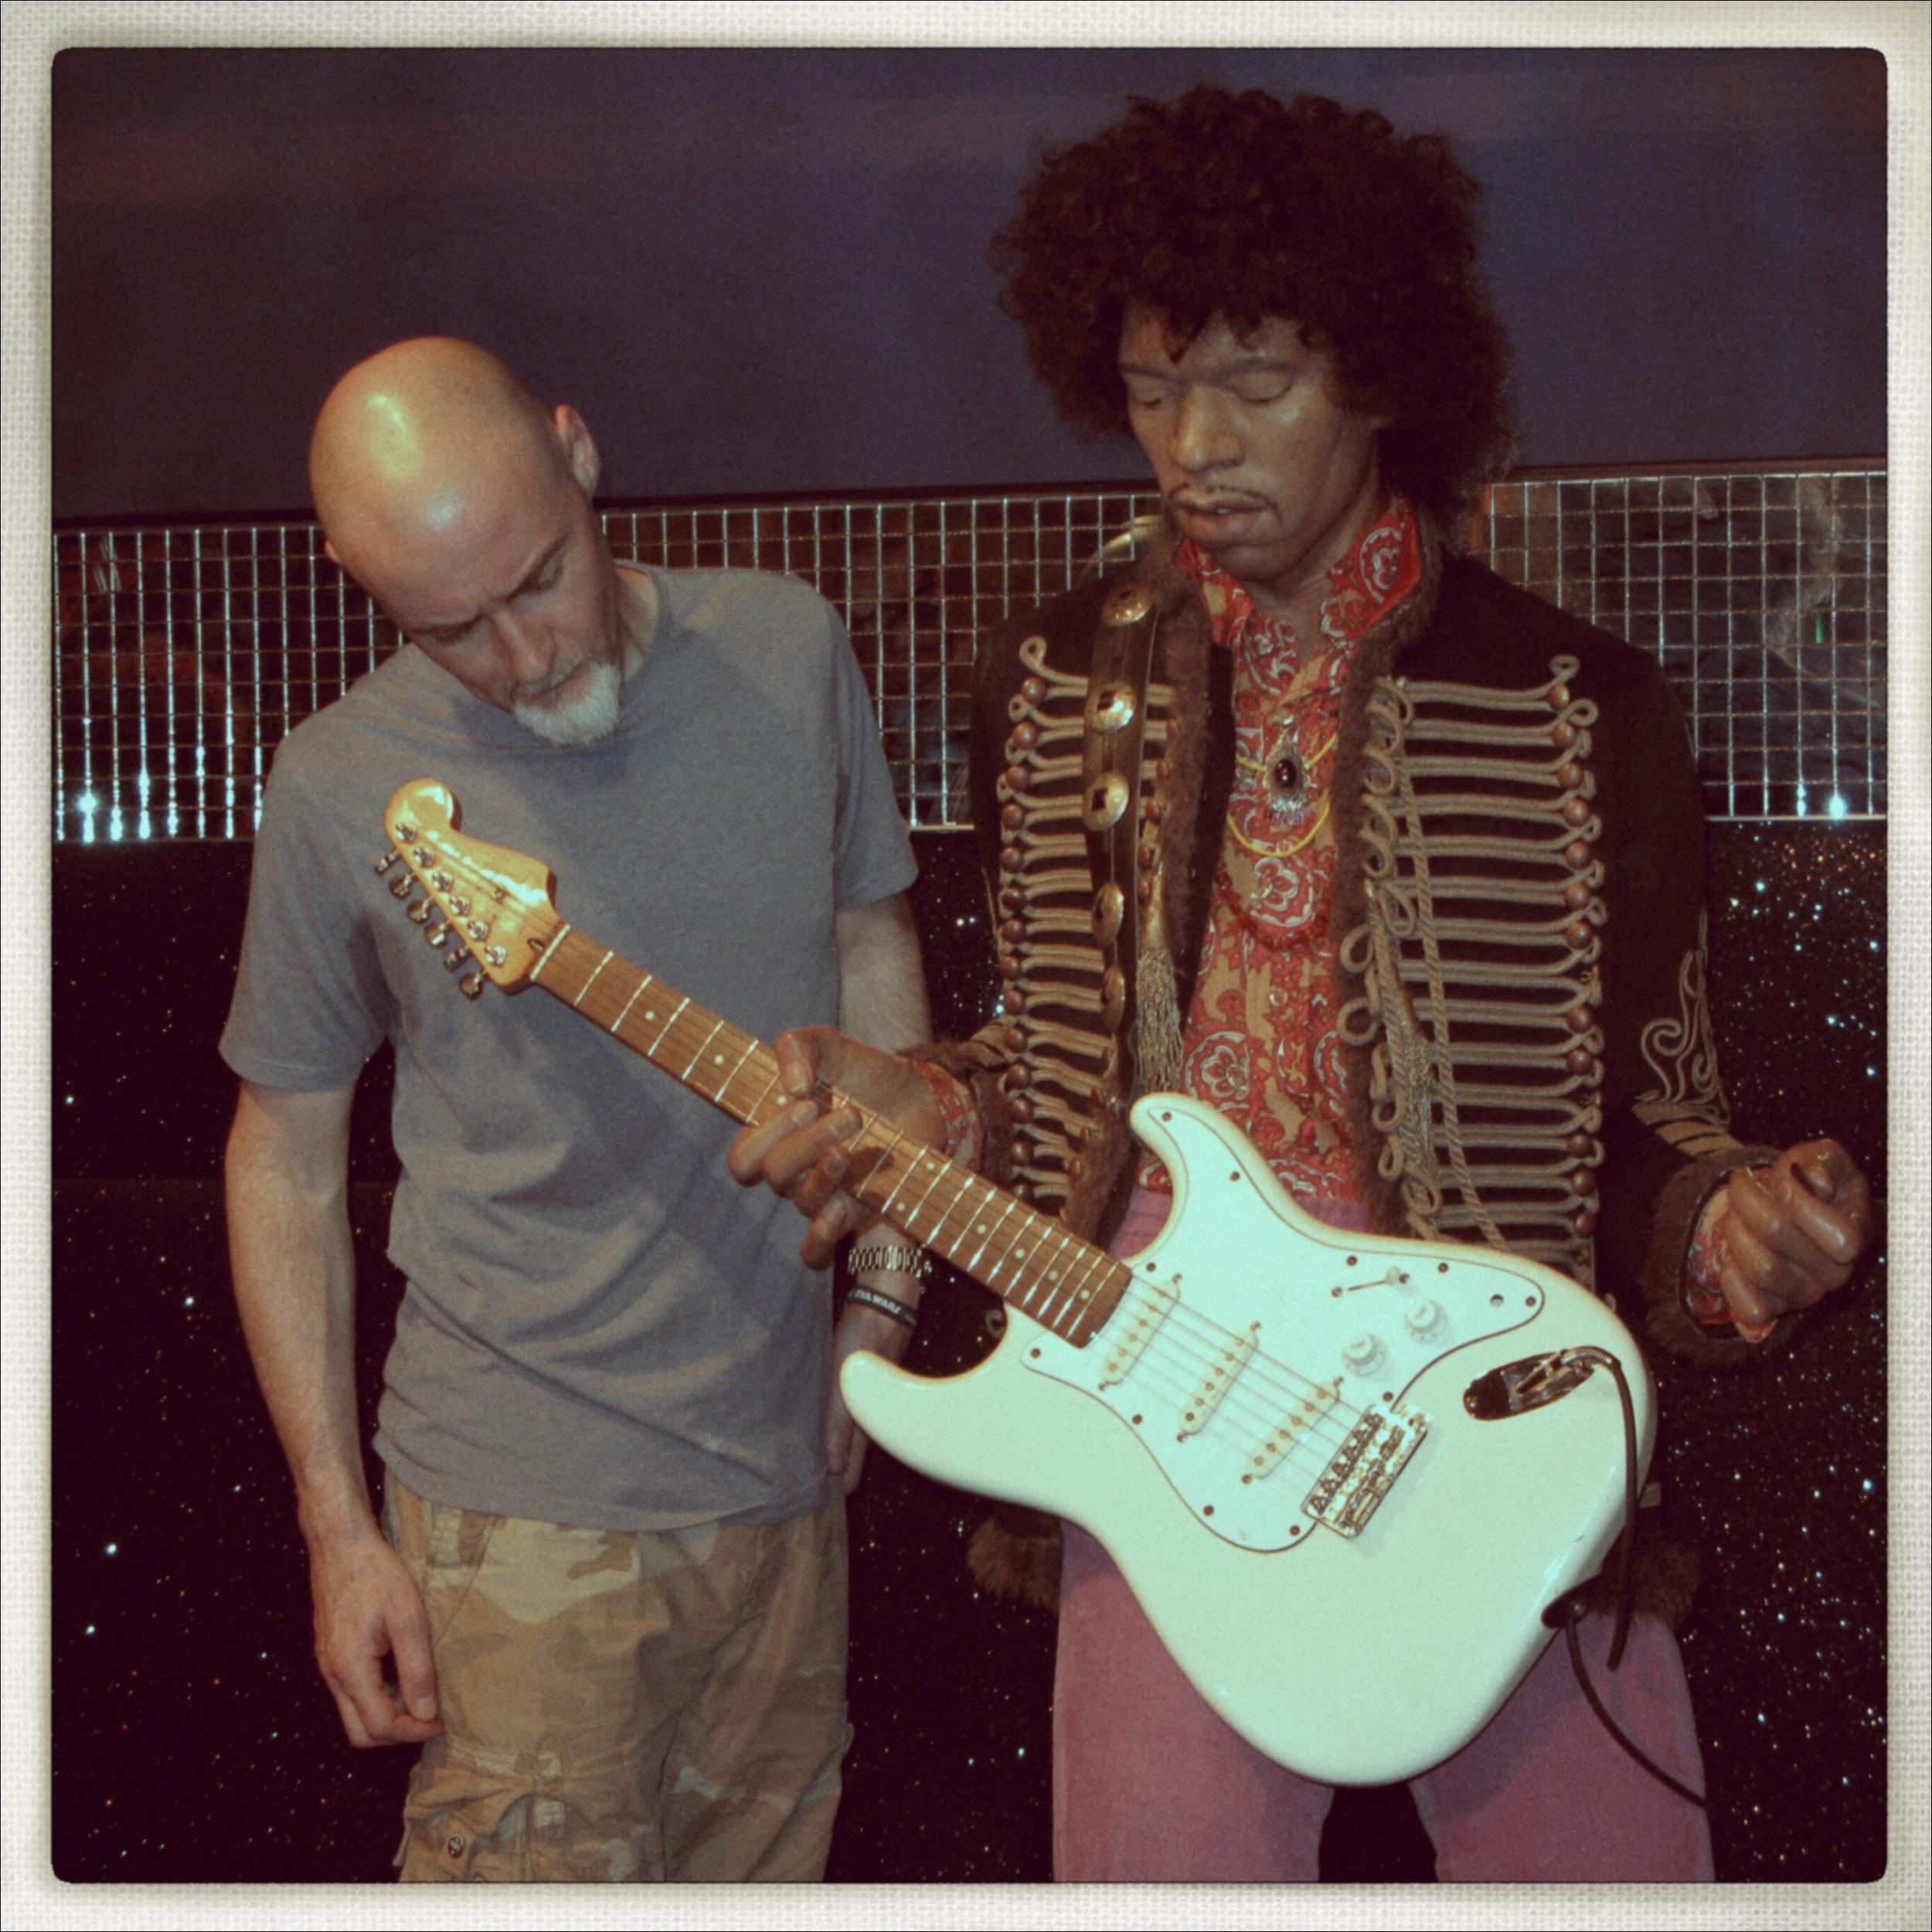 Gerry Hayes explains setup to Jimi Hendrix